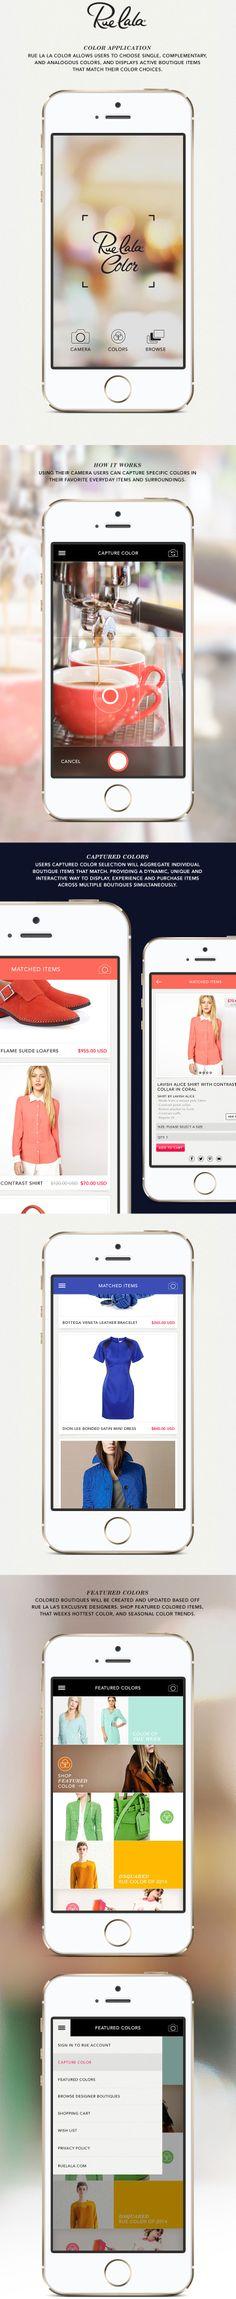 Rue La La Color Mobile App (Concept)